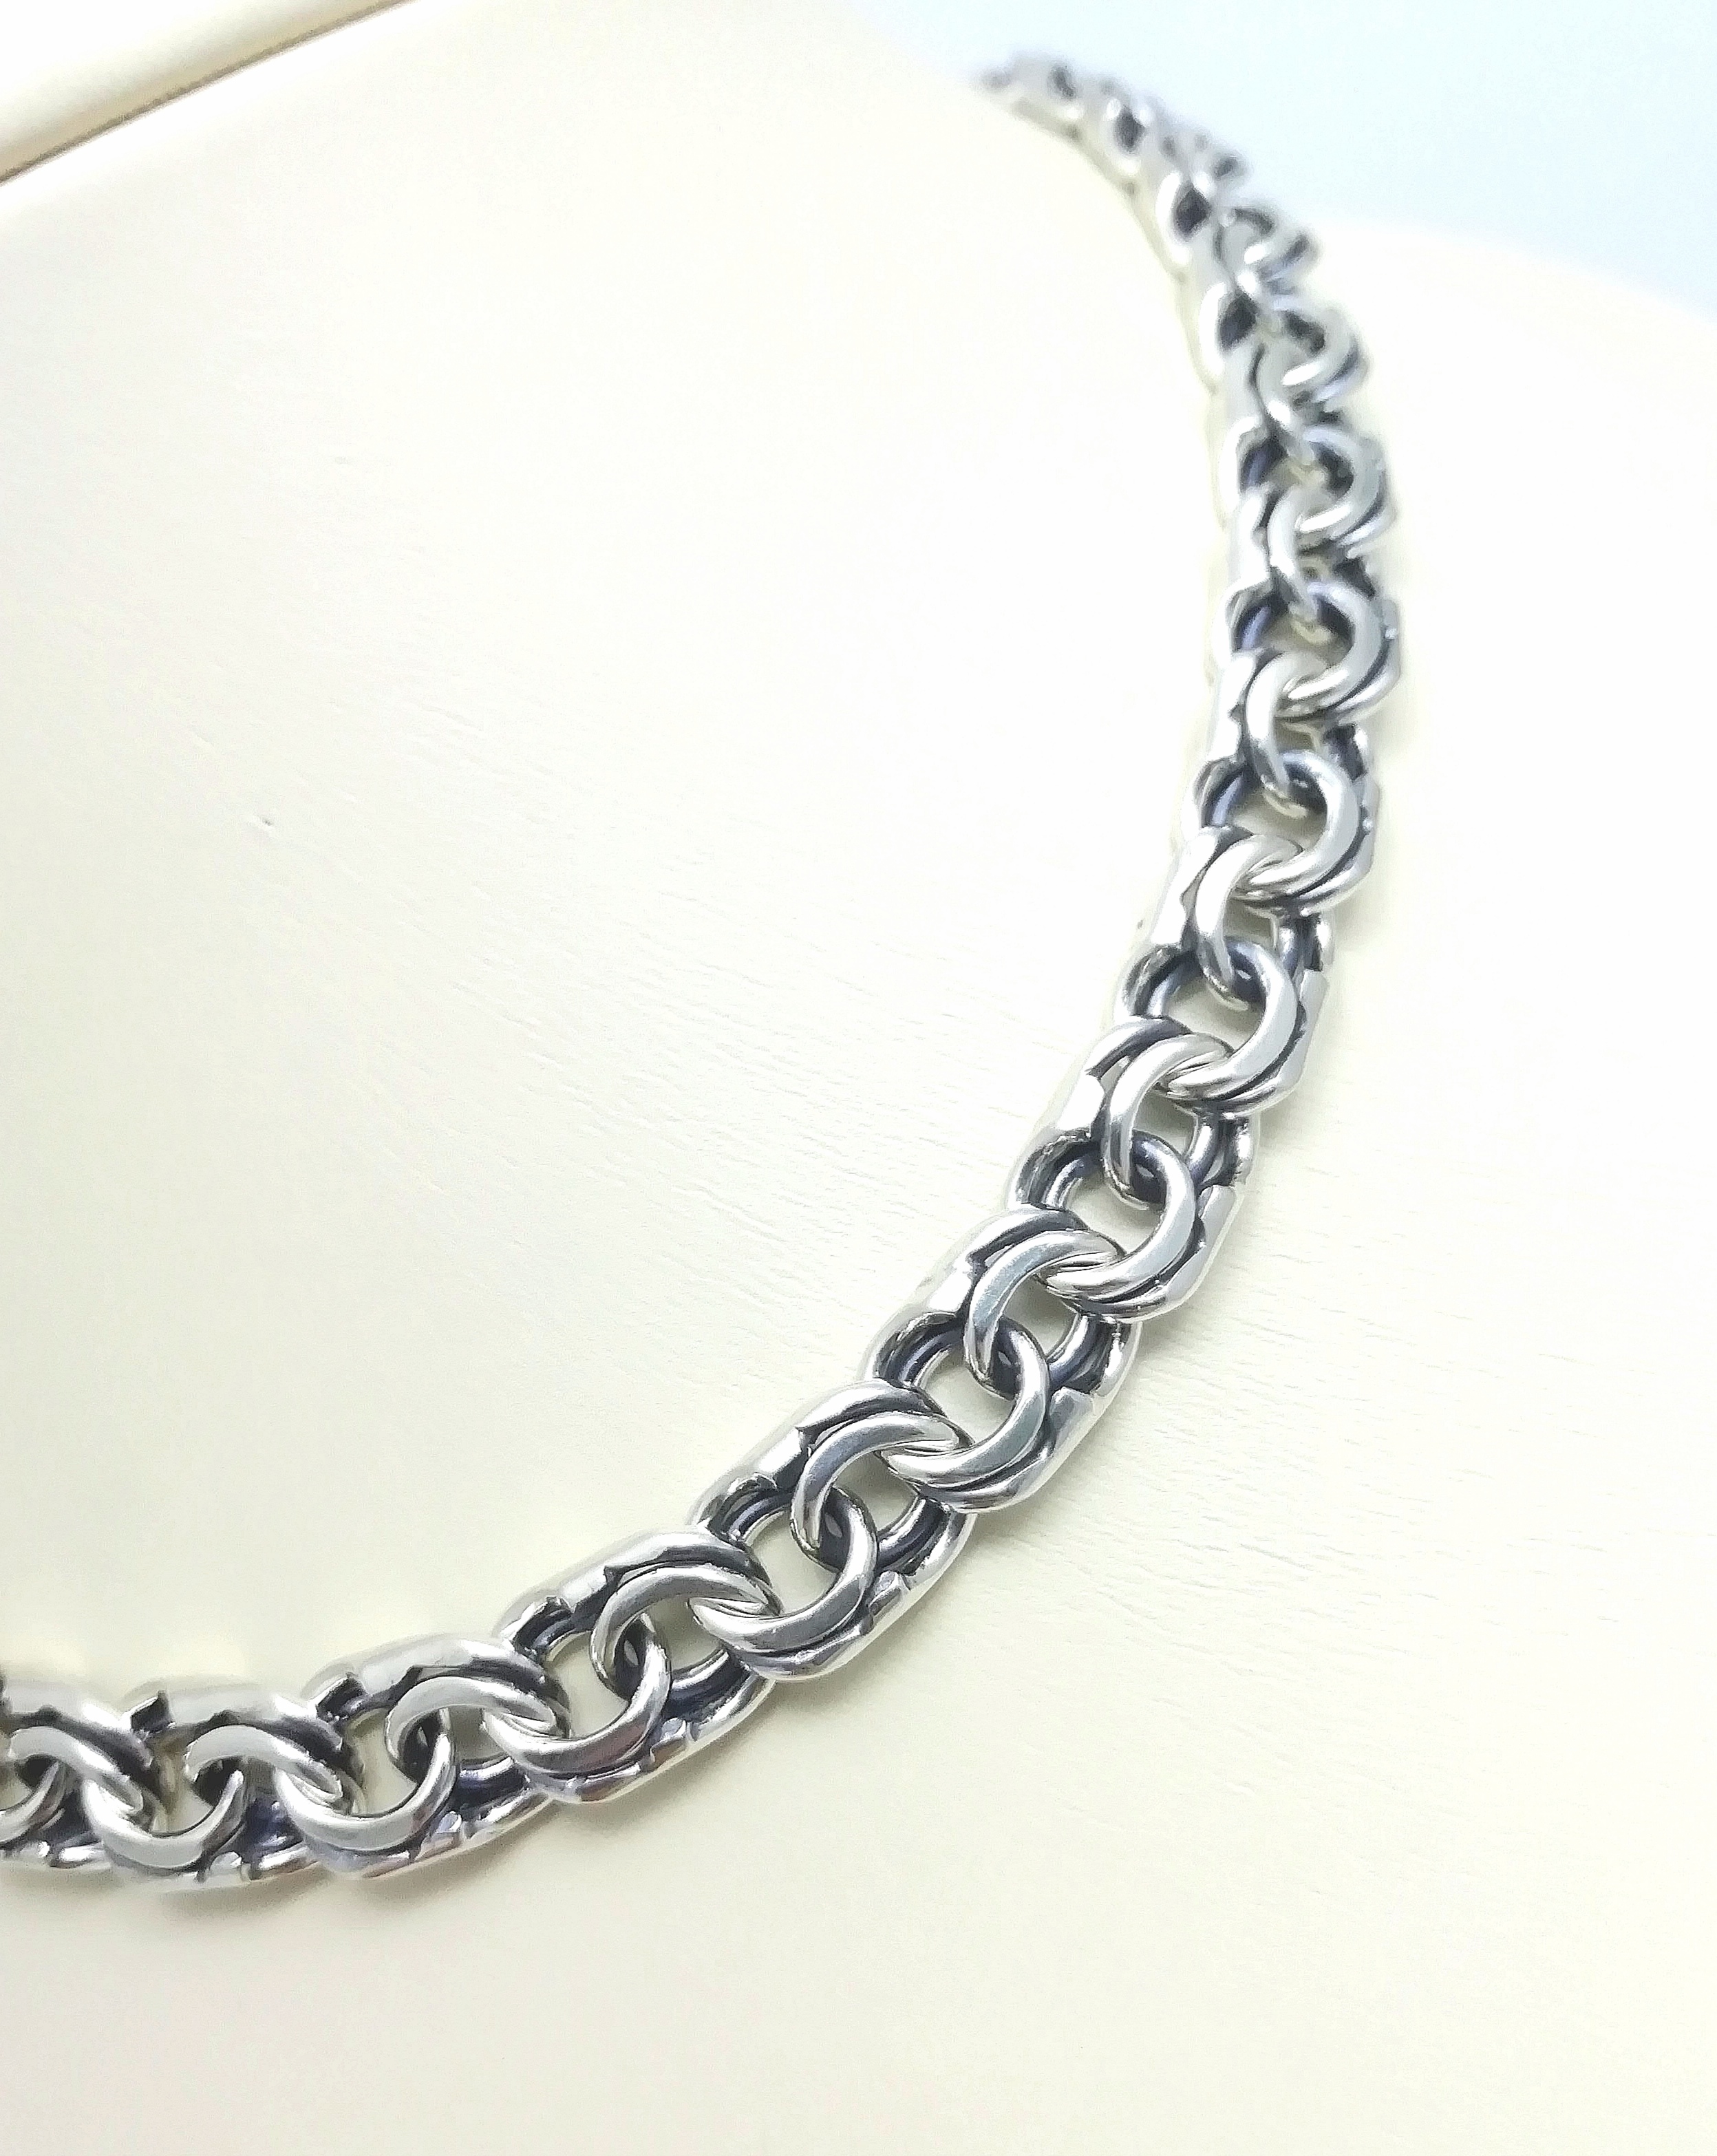 Серебро цепь дк240920-164 90,50гр